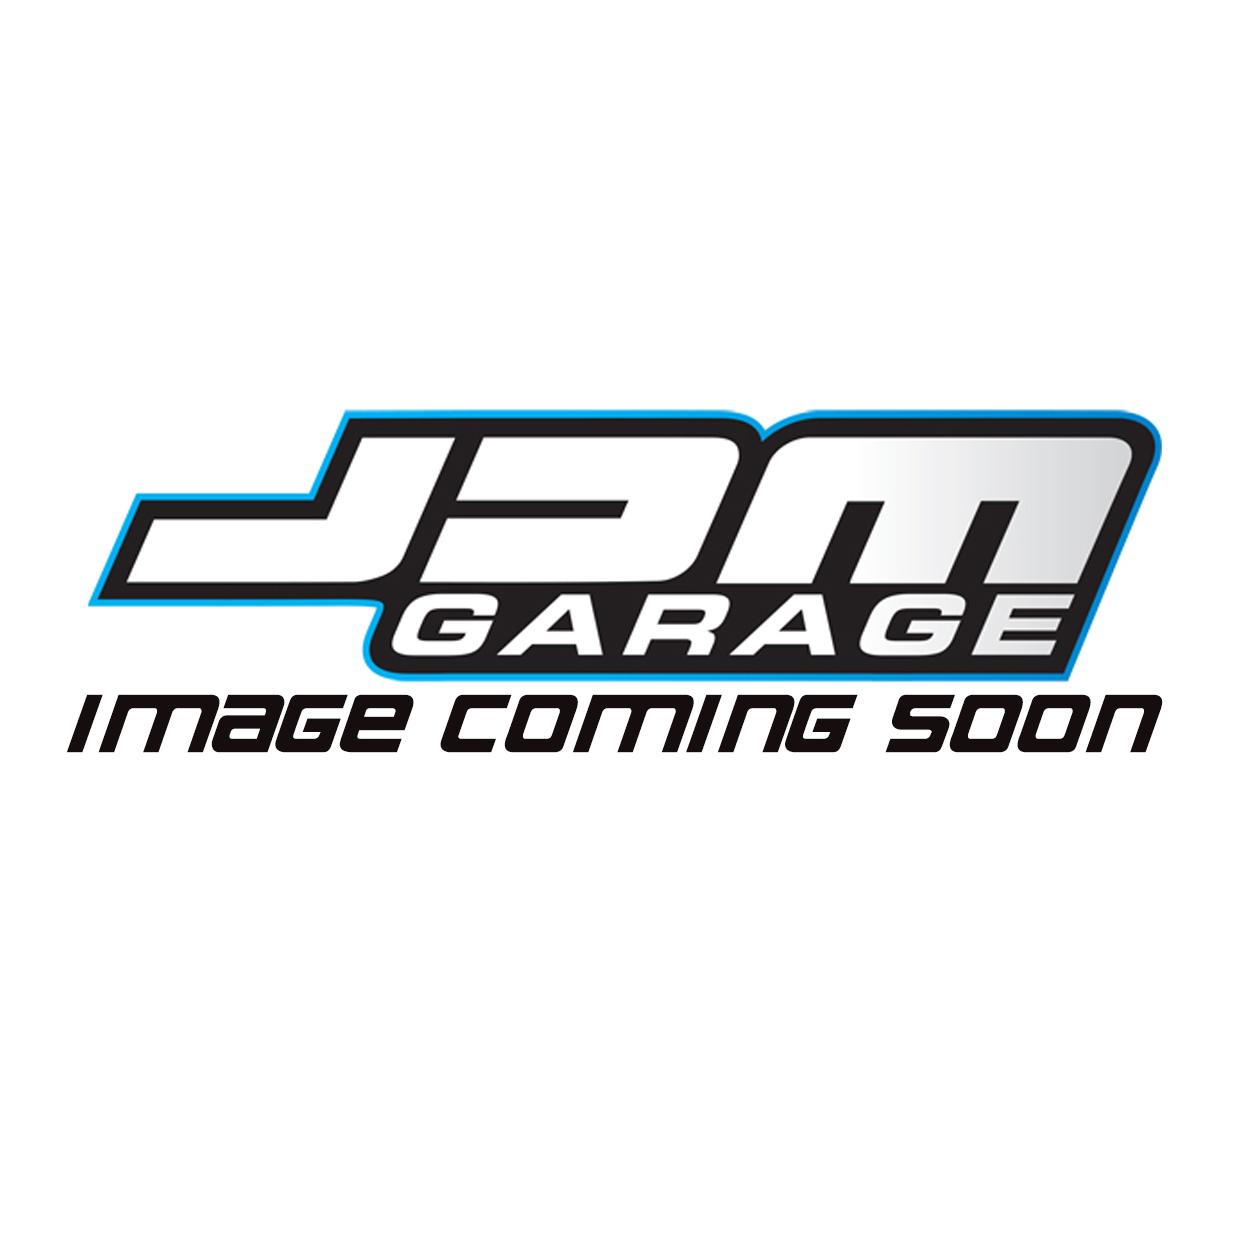 Genuine Nissan SR20DET Timing Chain Kit For Nissan Silvia S13 180SX S14 S15 200SX Pulsar GTIR